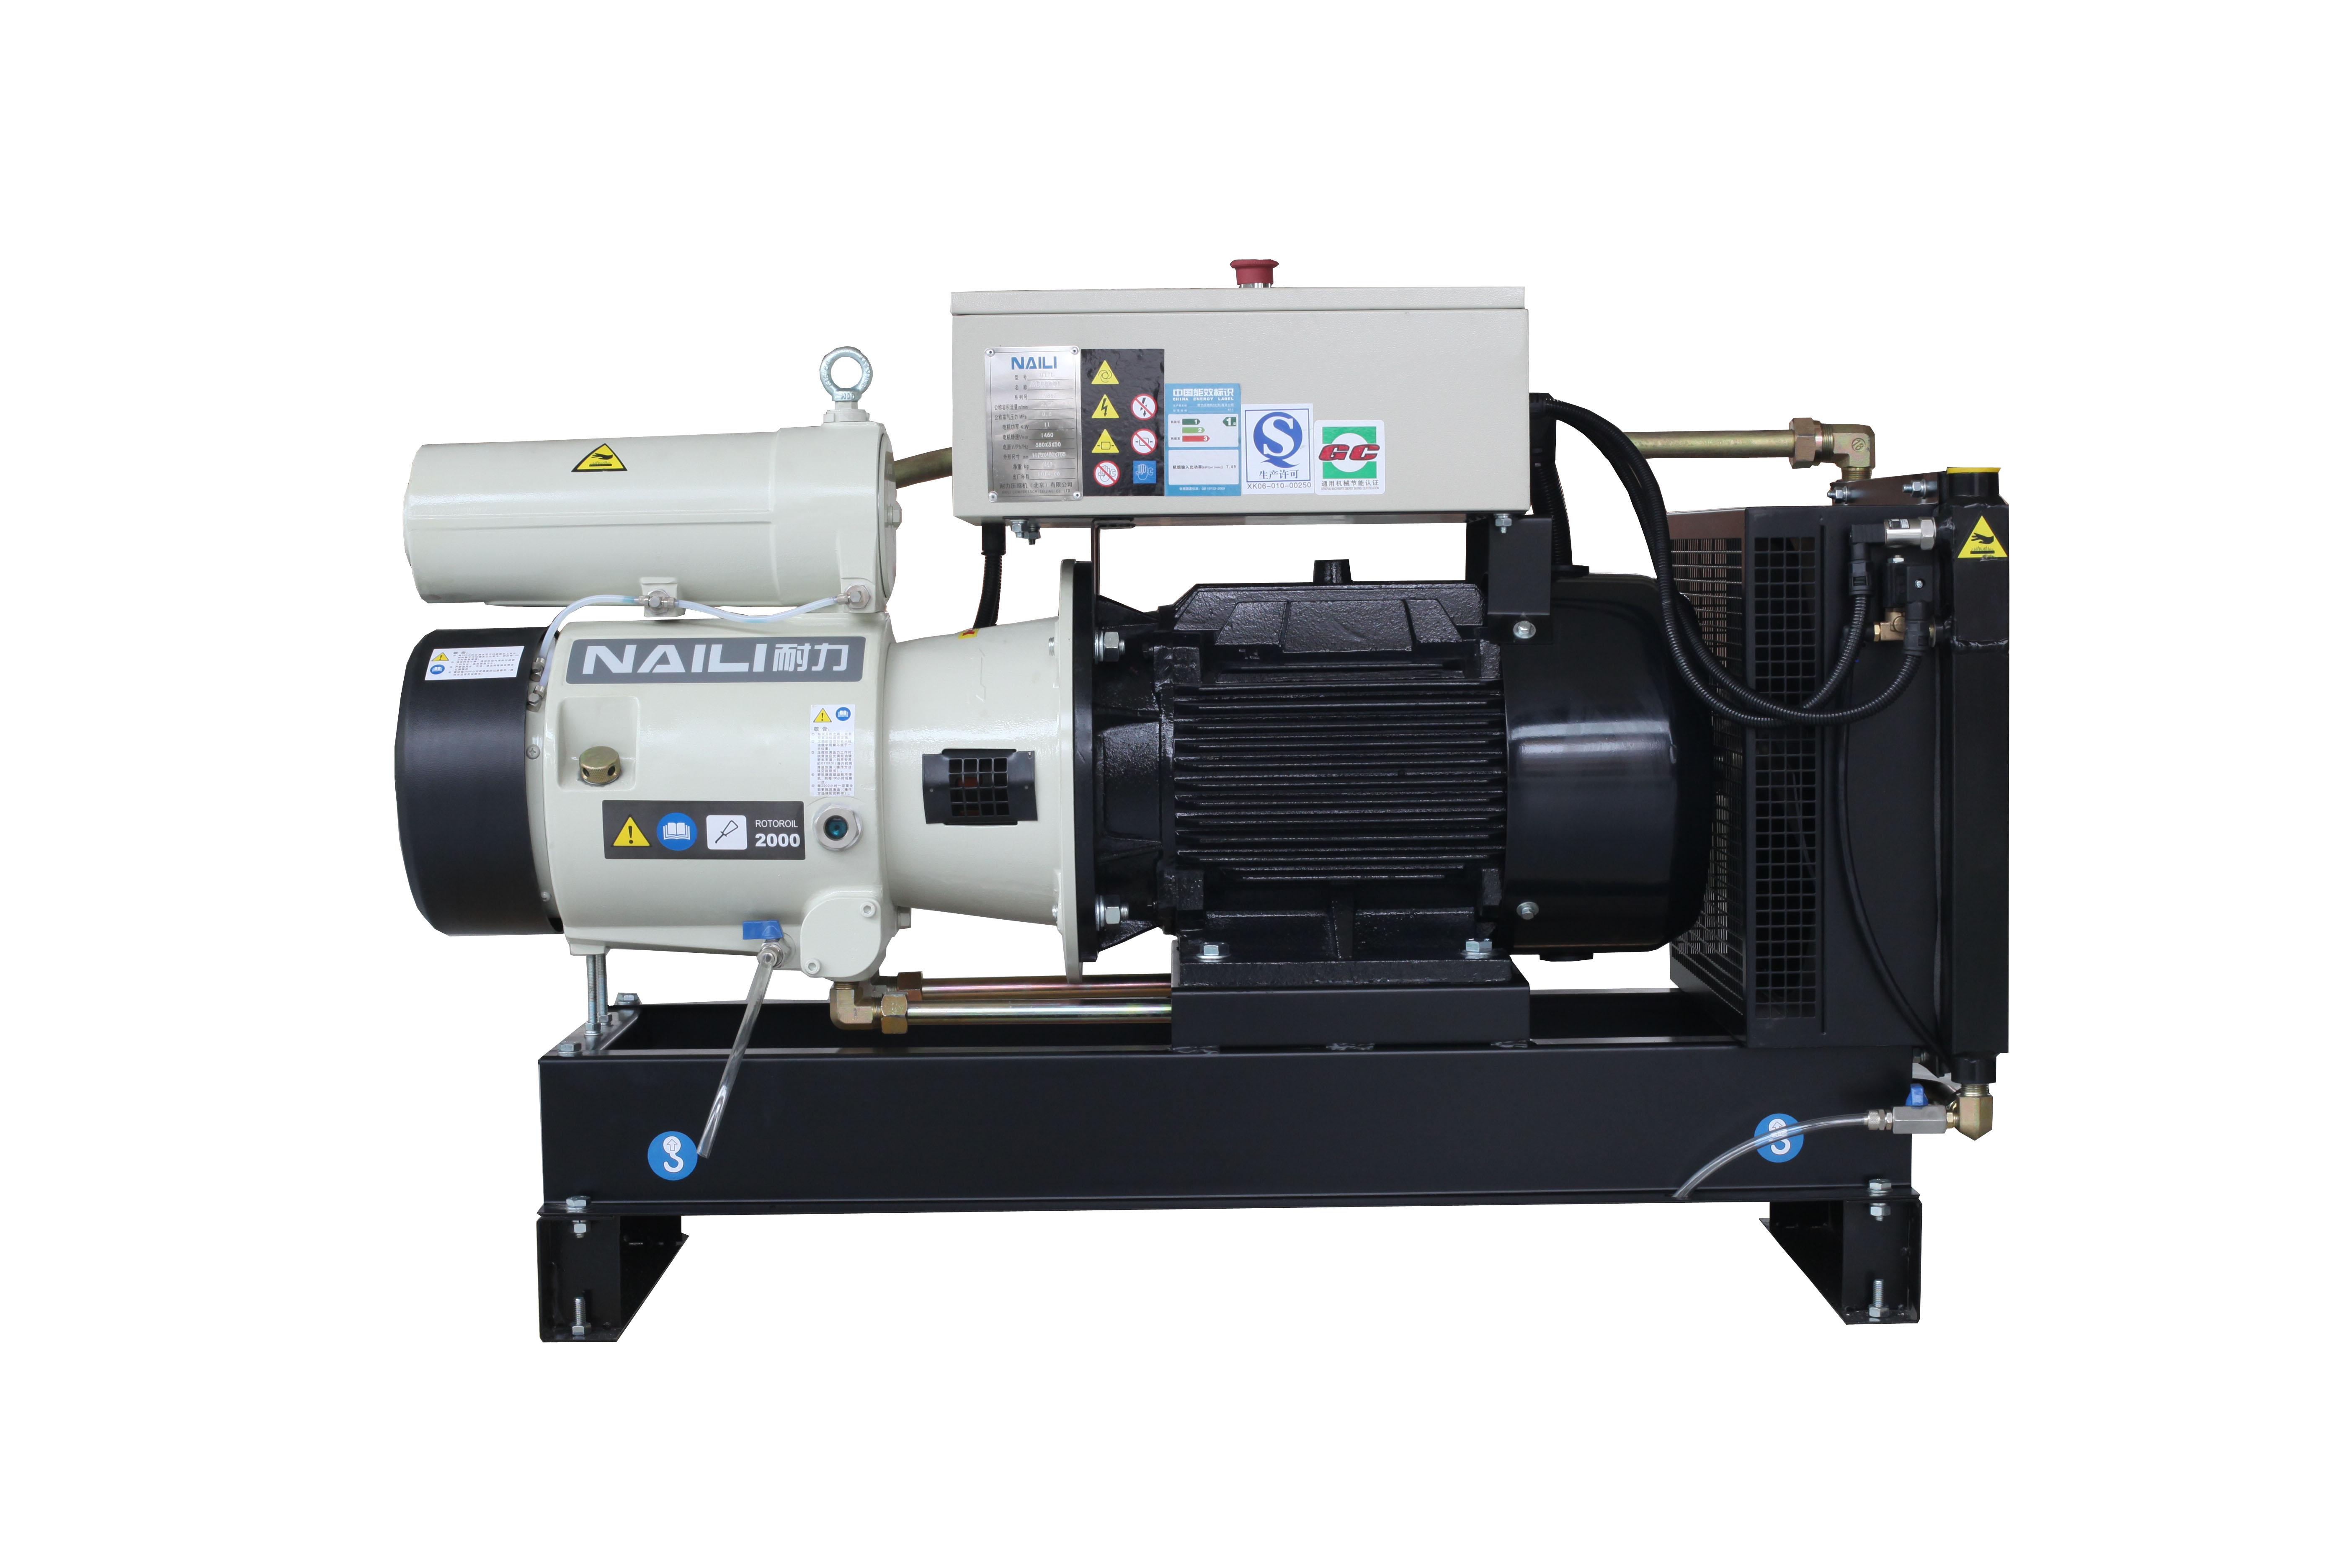 NAILI Rotary Vane Air Compressor for sale